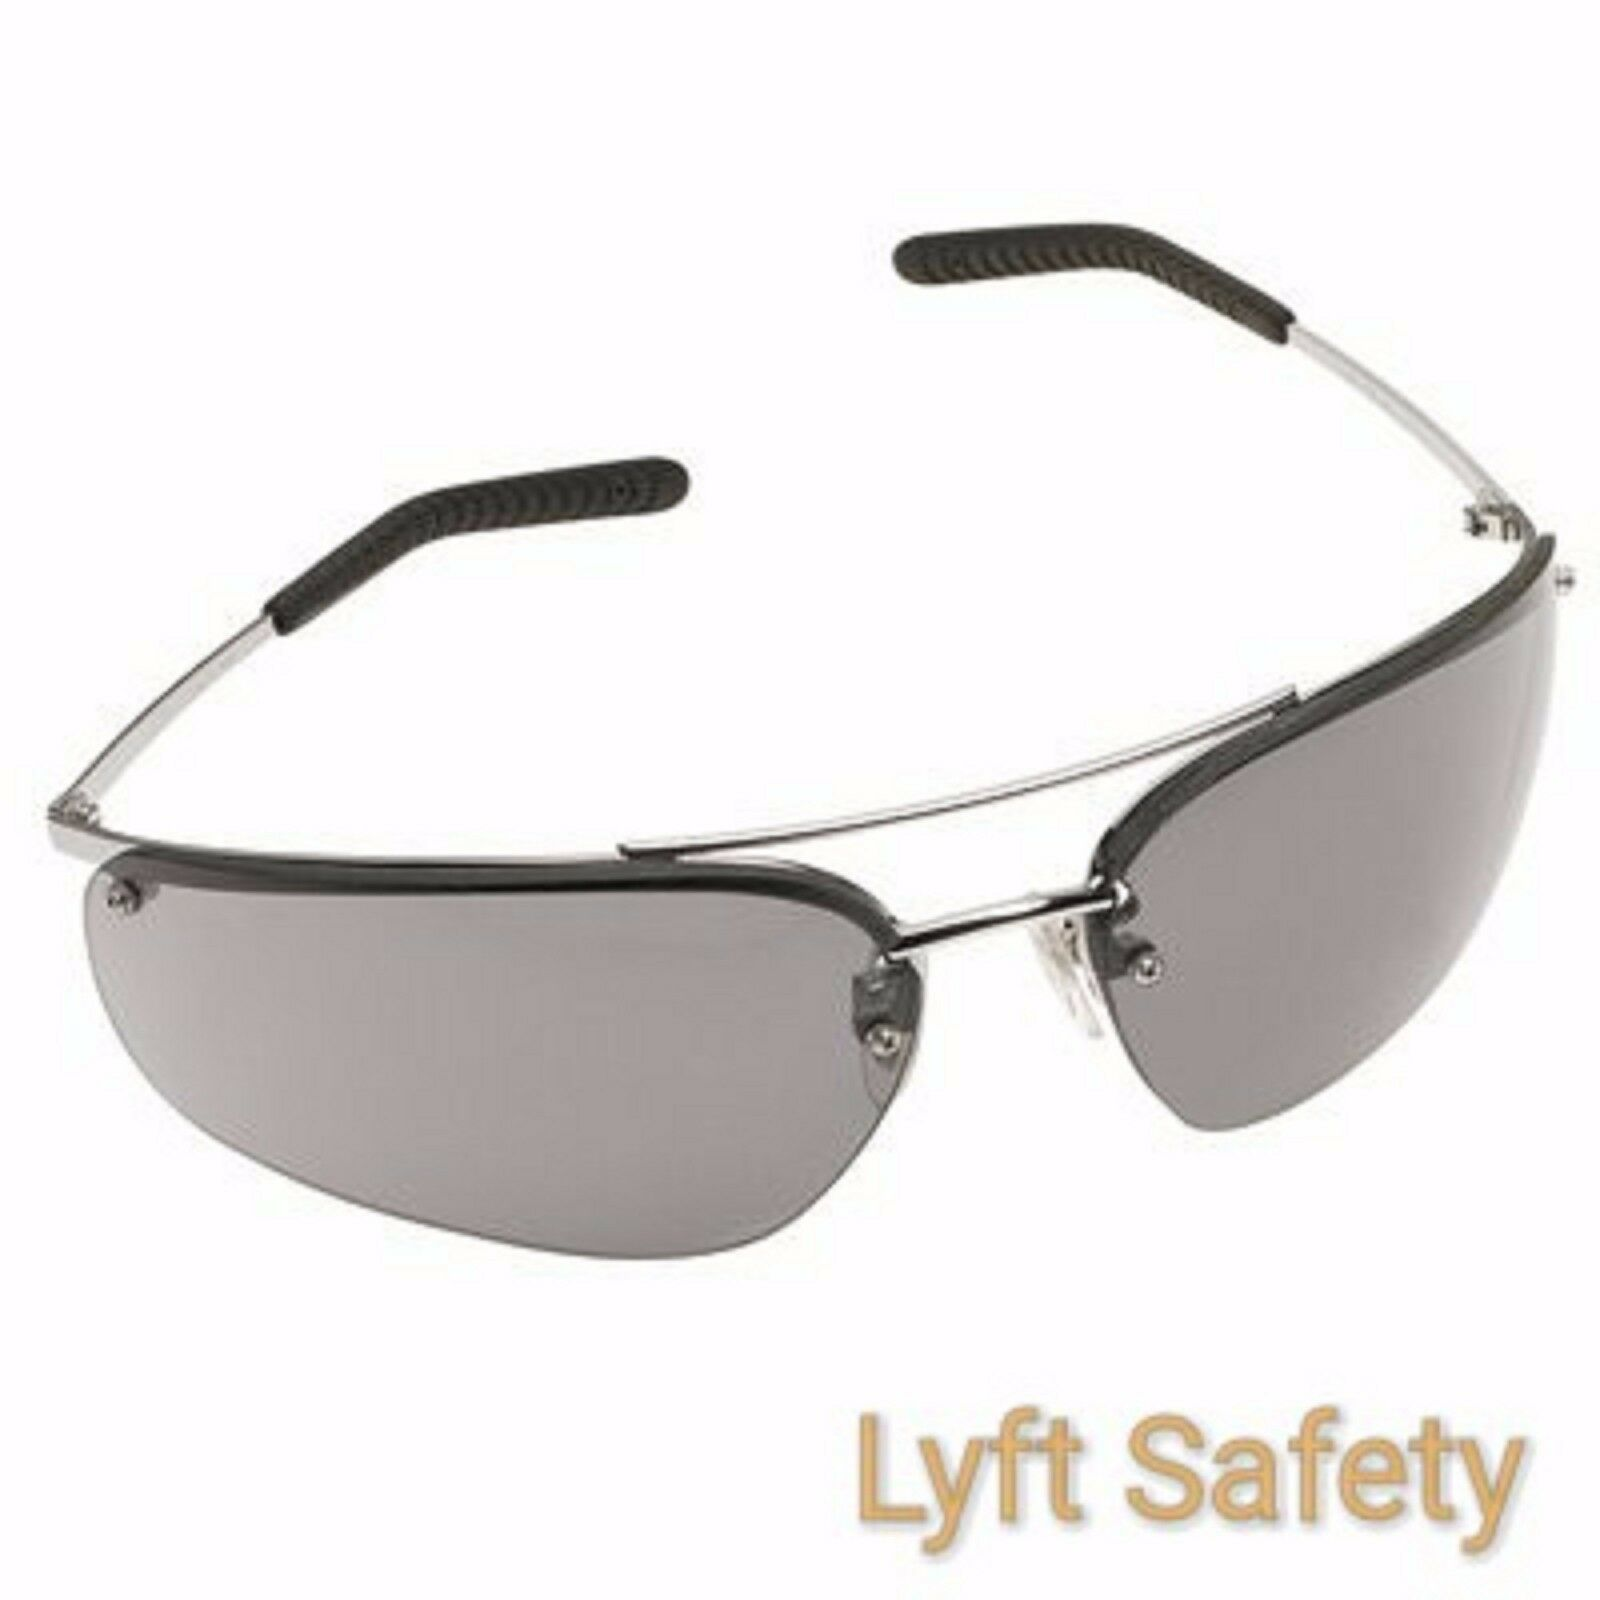 3M Metaliks Safety Glasses Eye Predection Anti-Fog Tint 15171-10000-20 3-Pair